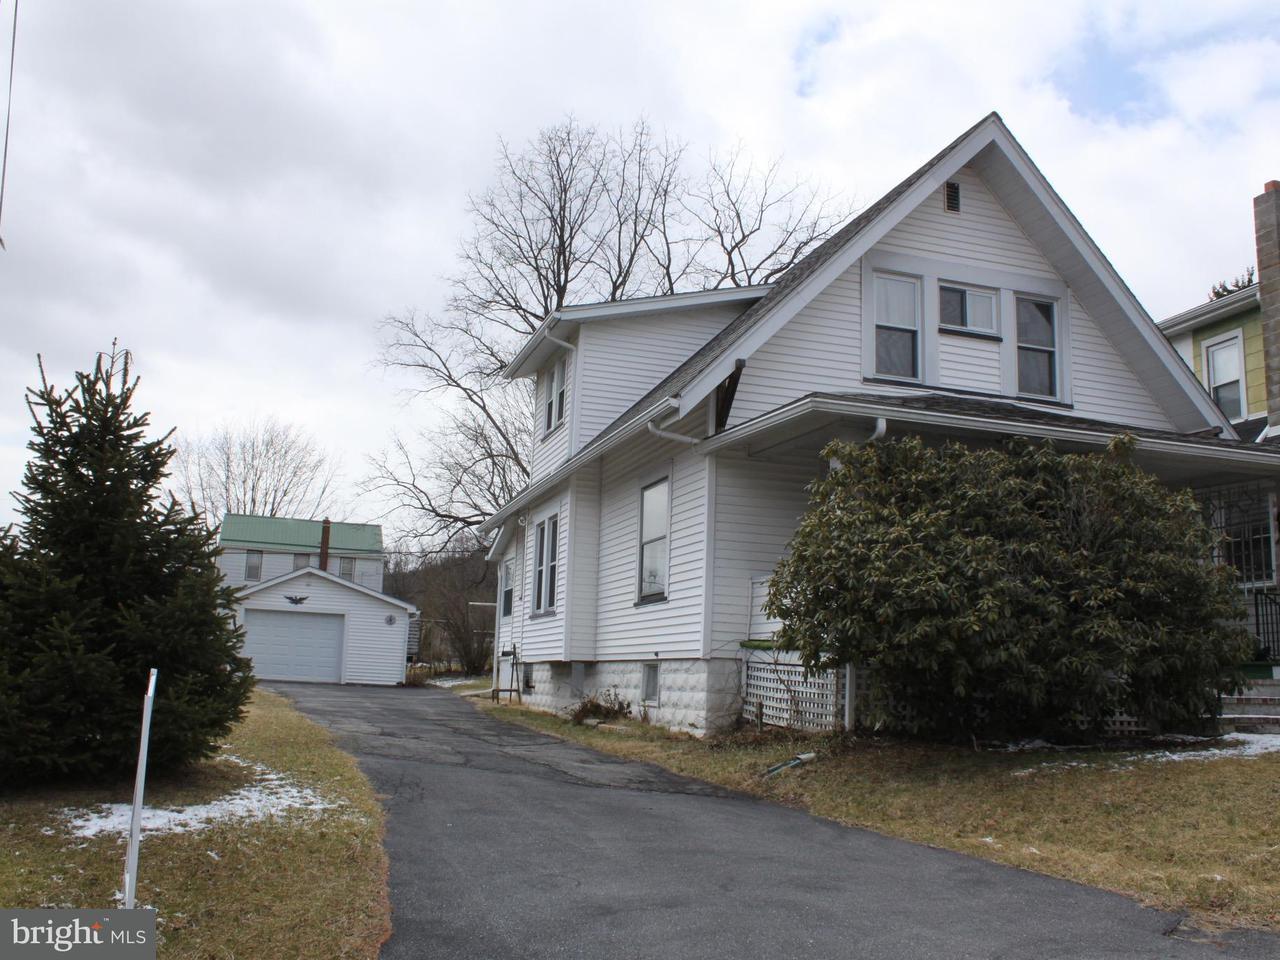 Single Family for Sale at 37 West Ridge St Mount Union, Pennsylvania 17066 United States